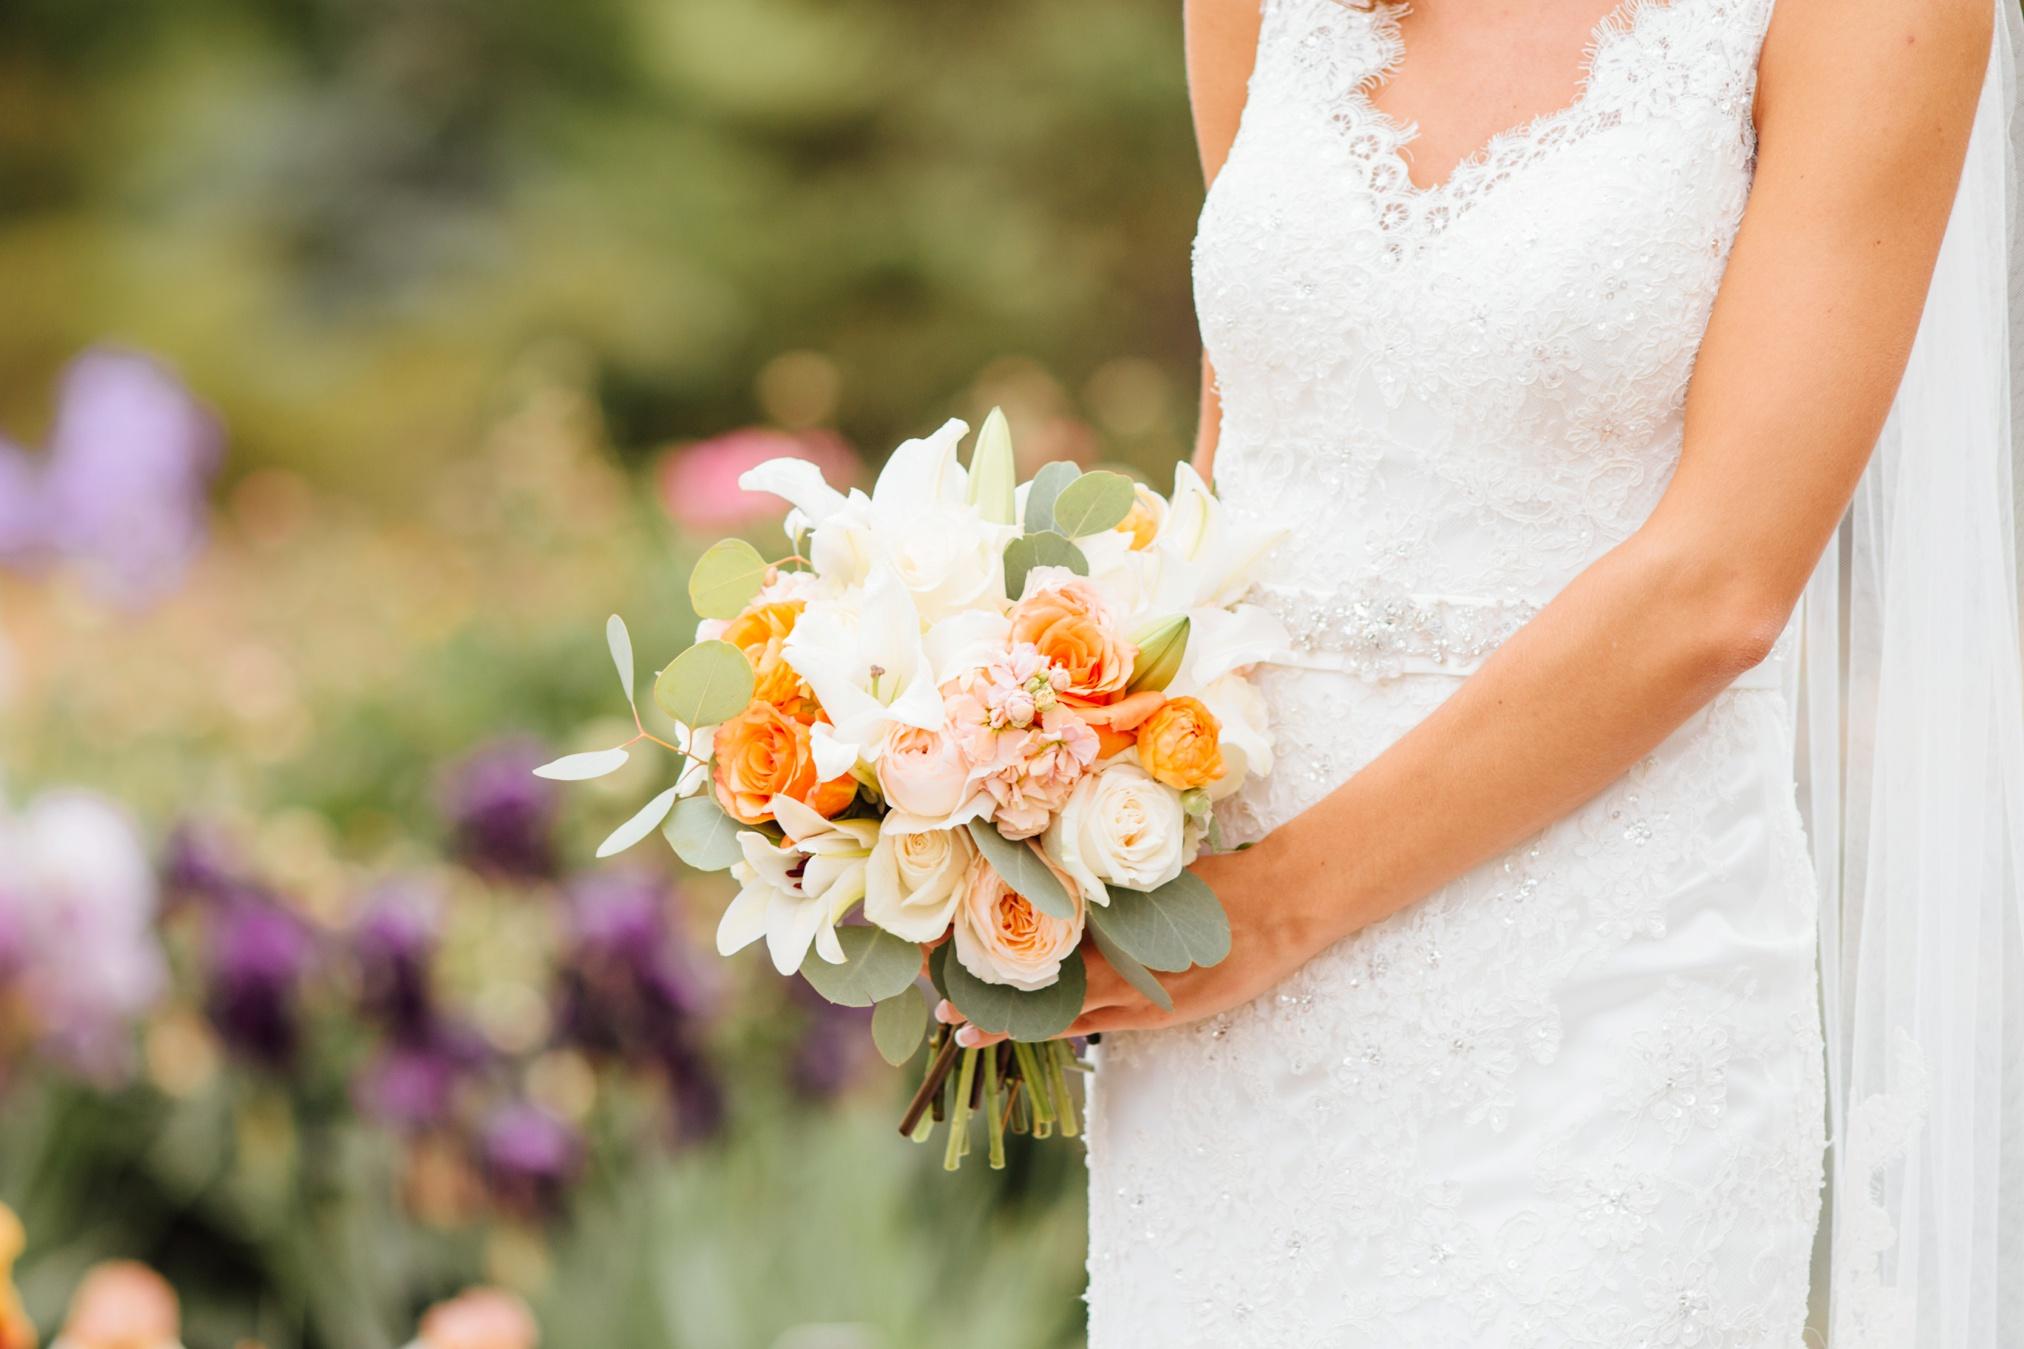 schmid_wedding-119.jpg